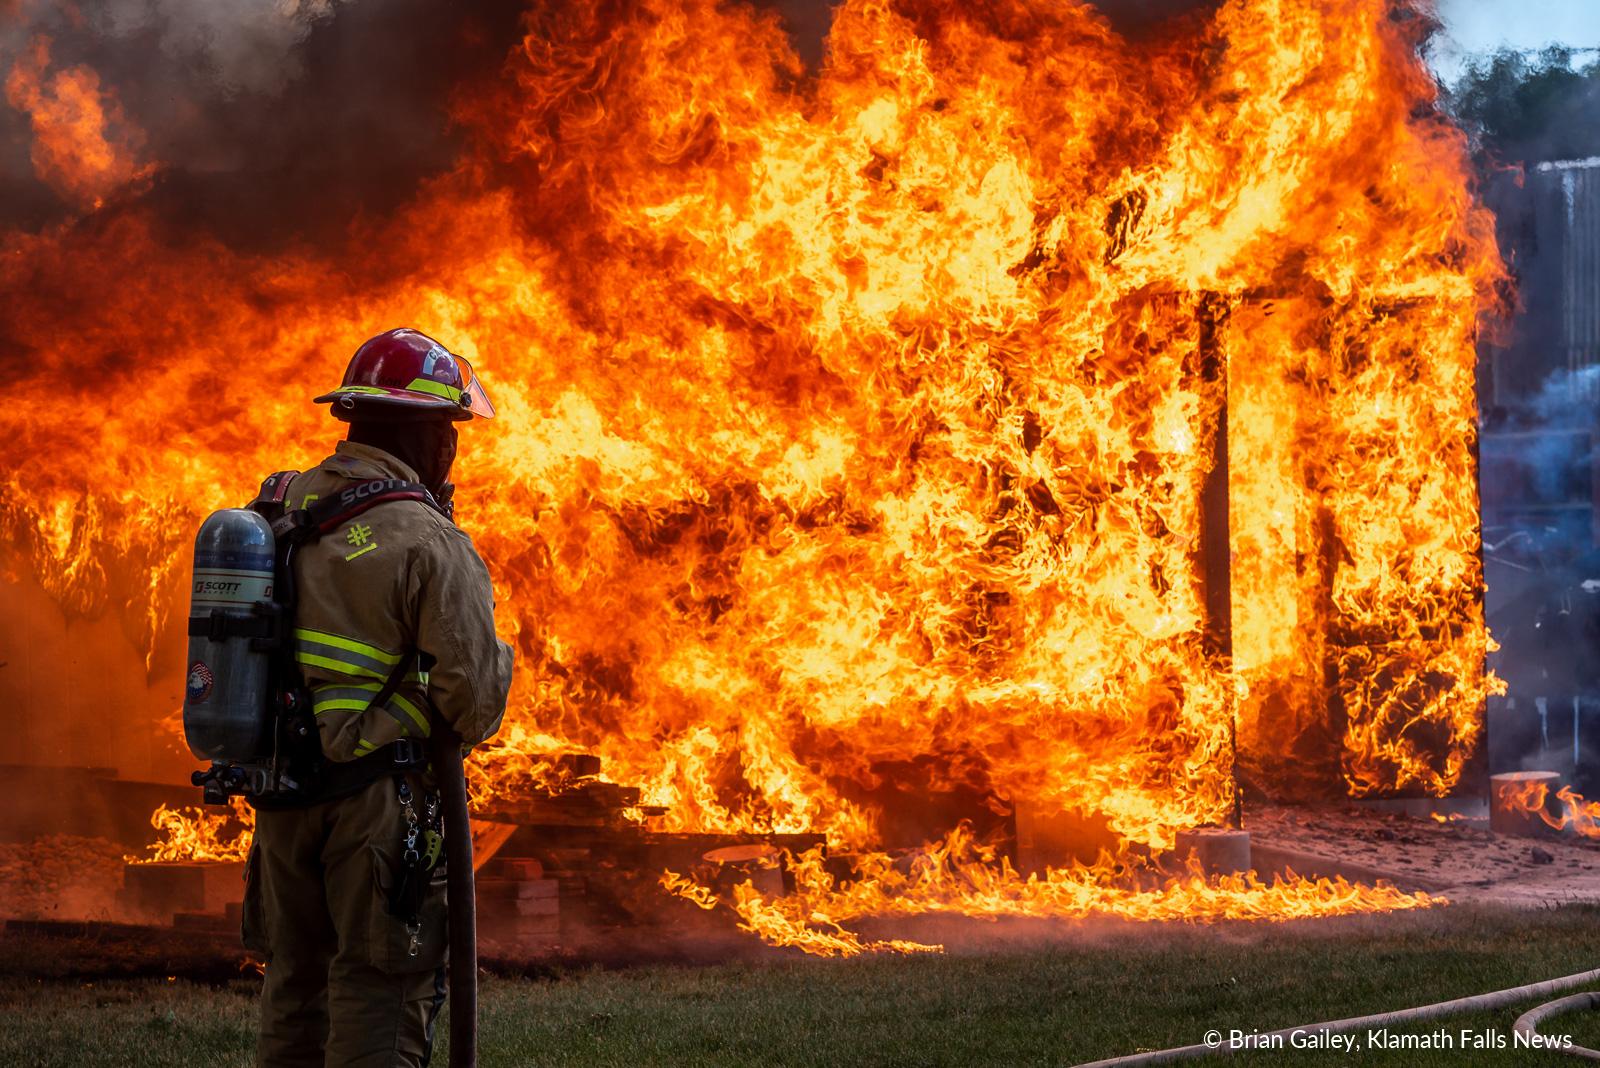 Structure fire, Thompson Ave, Klamath Falls June 27, 2019. Image, Brian Gailey / Klamath Falls News